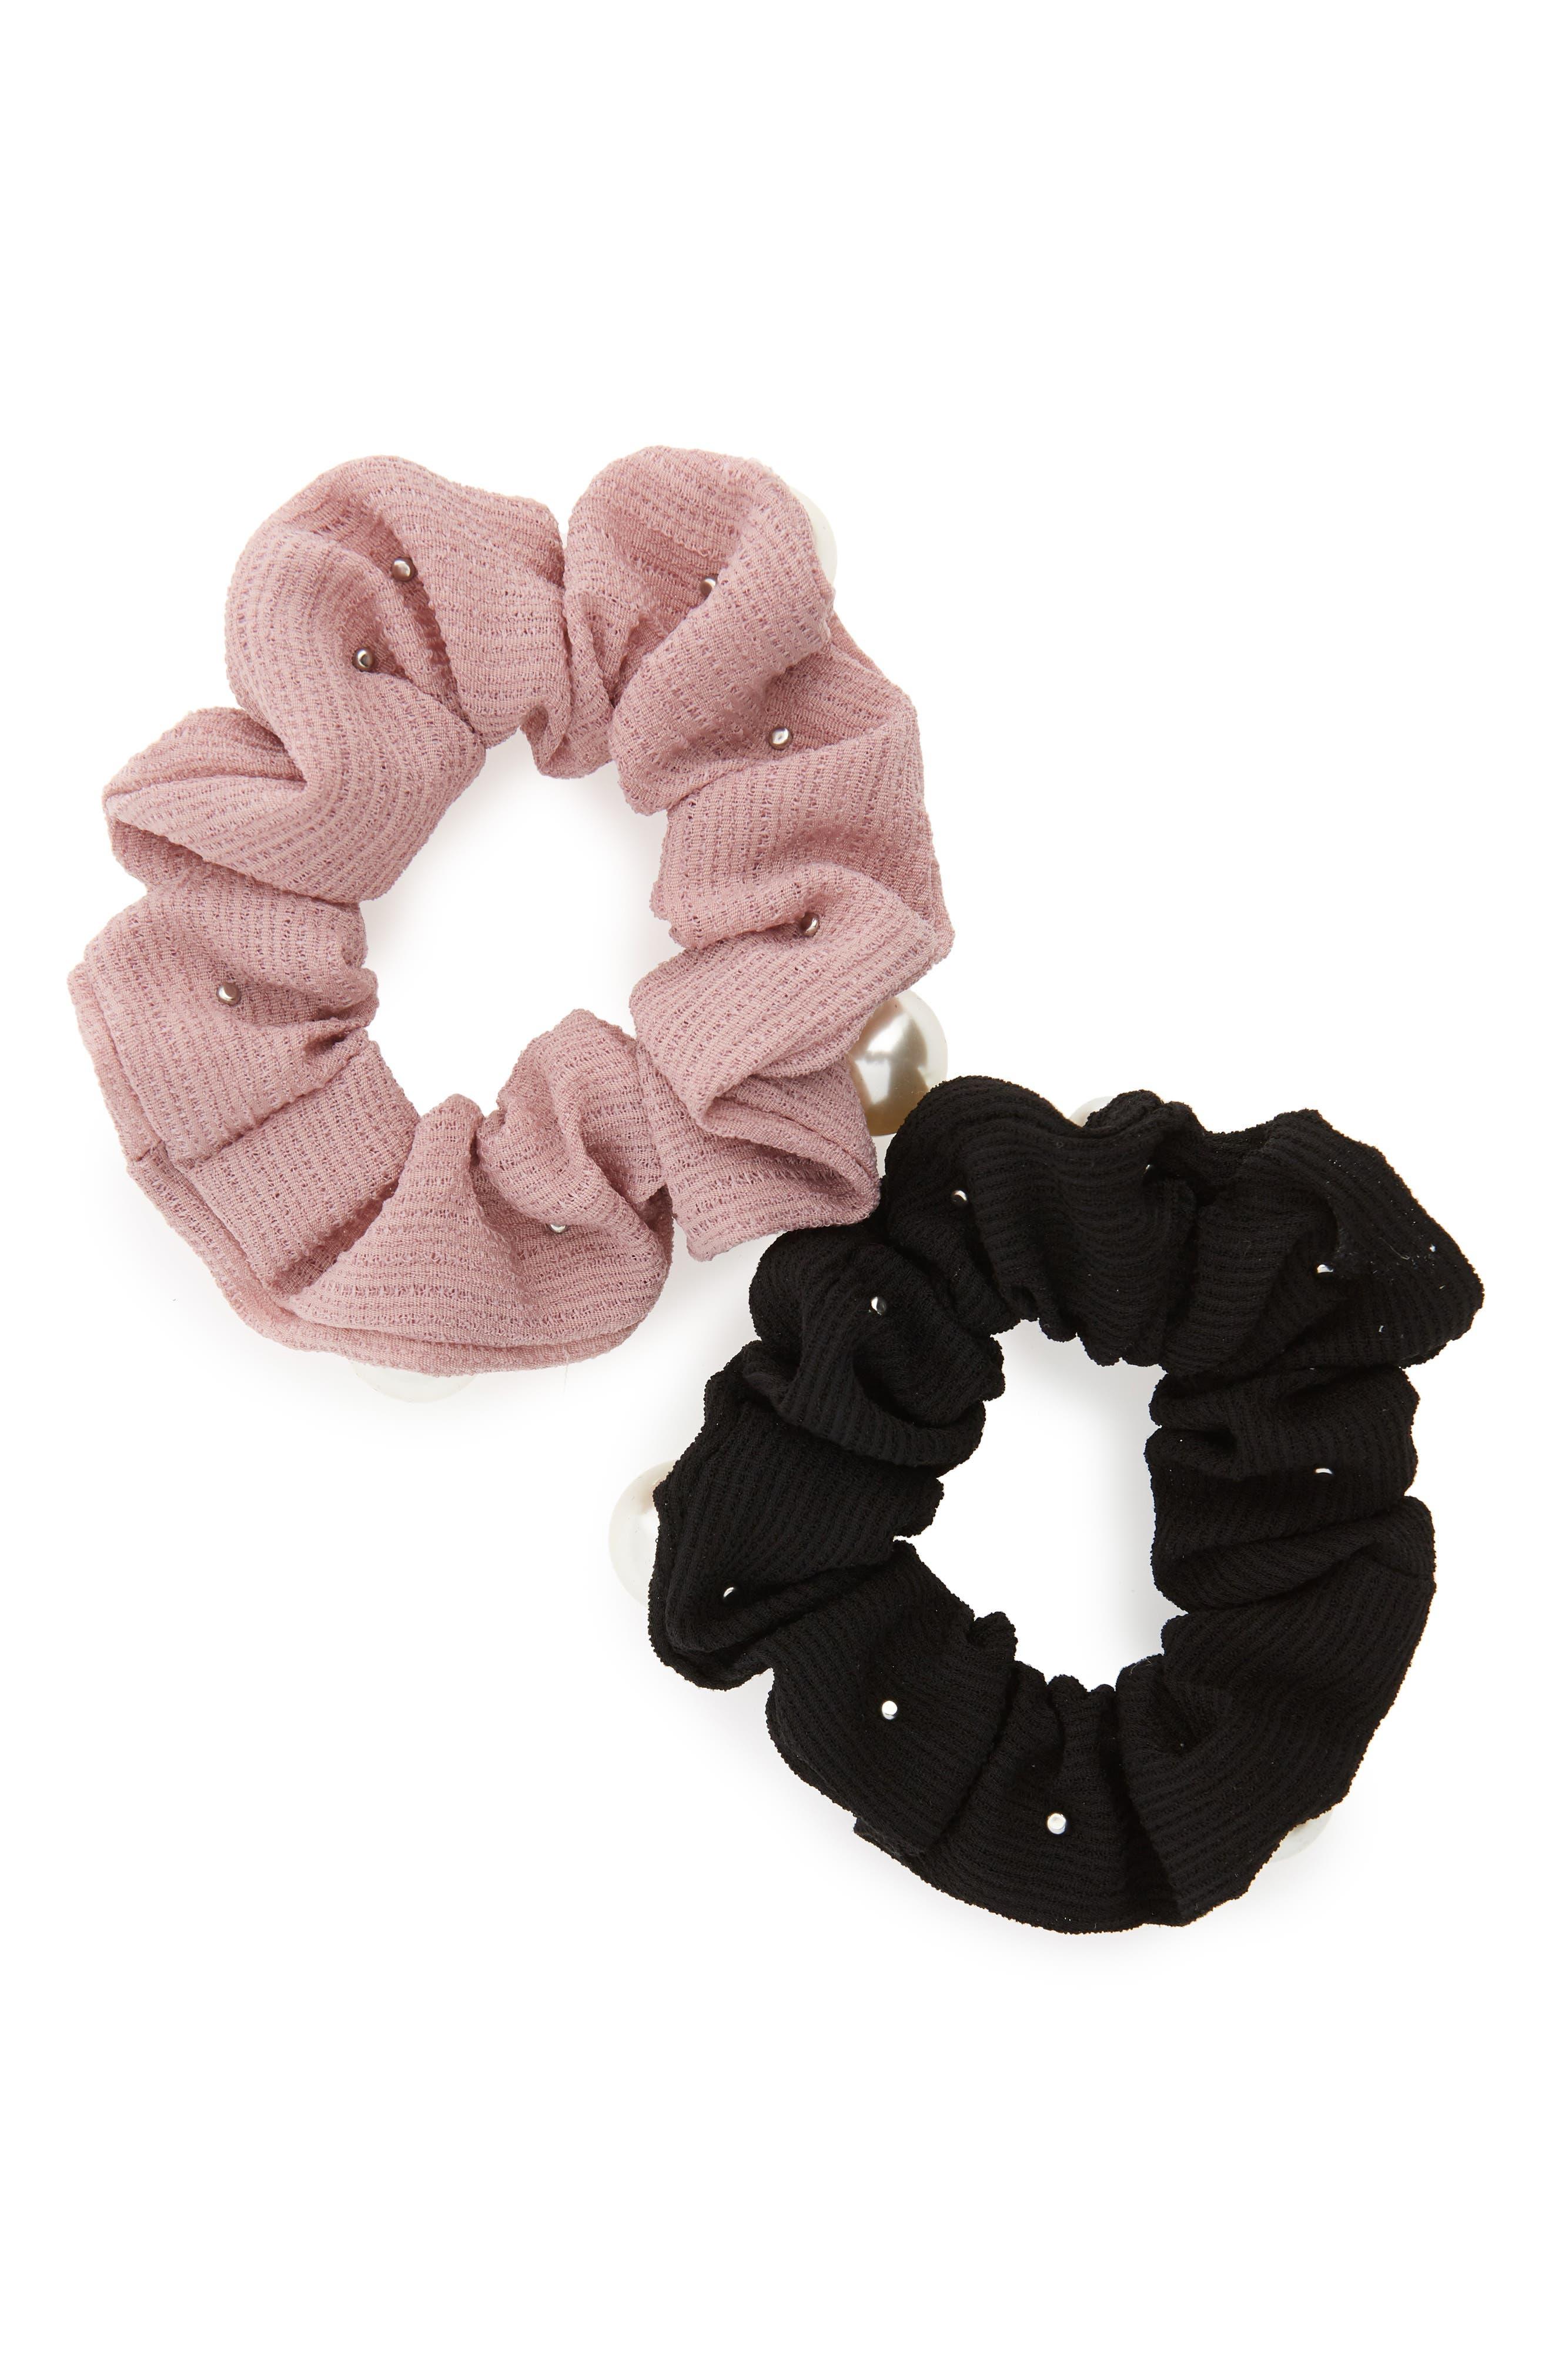 2-Pack Imitation Pearl Scrunchies,                             Alternate thumbnail 2, color,                             Black/ Pink